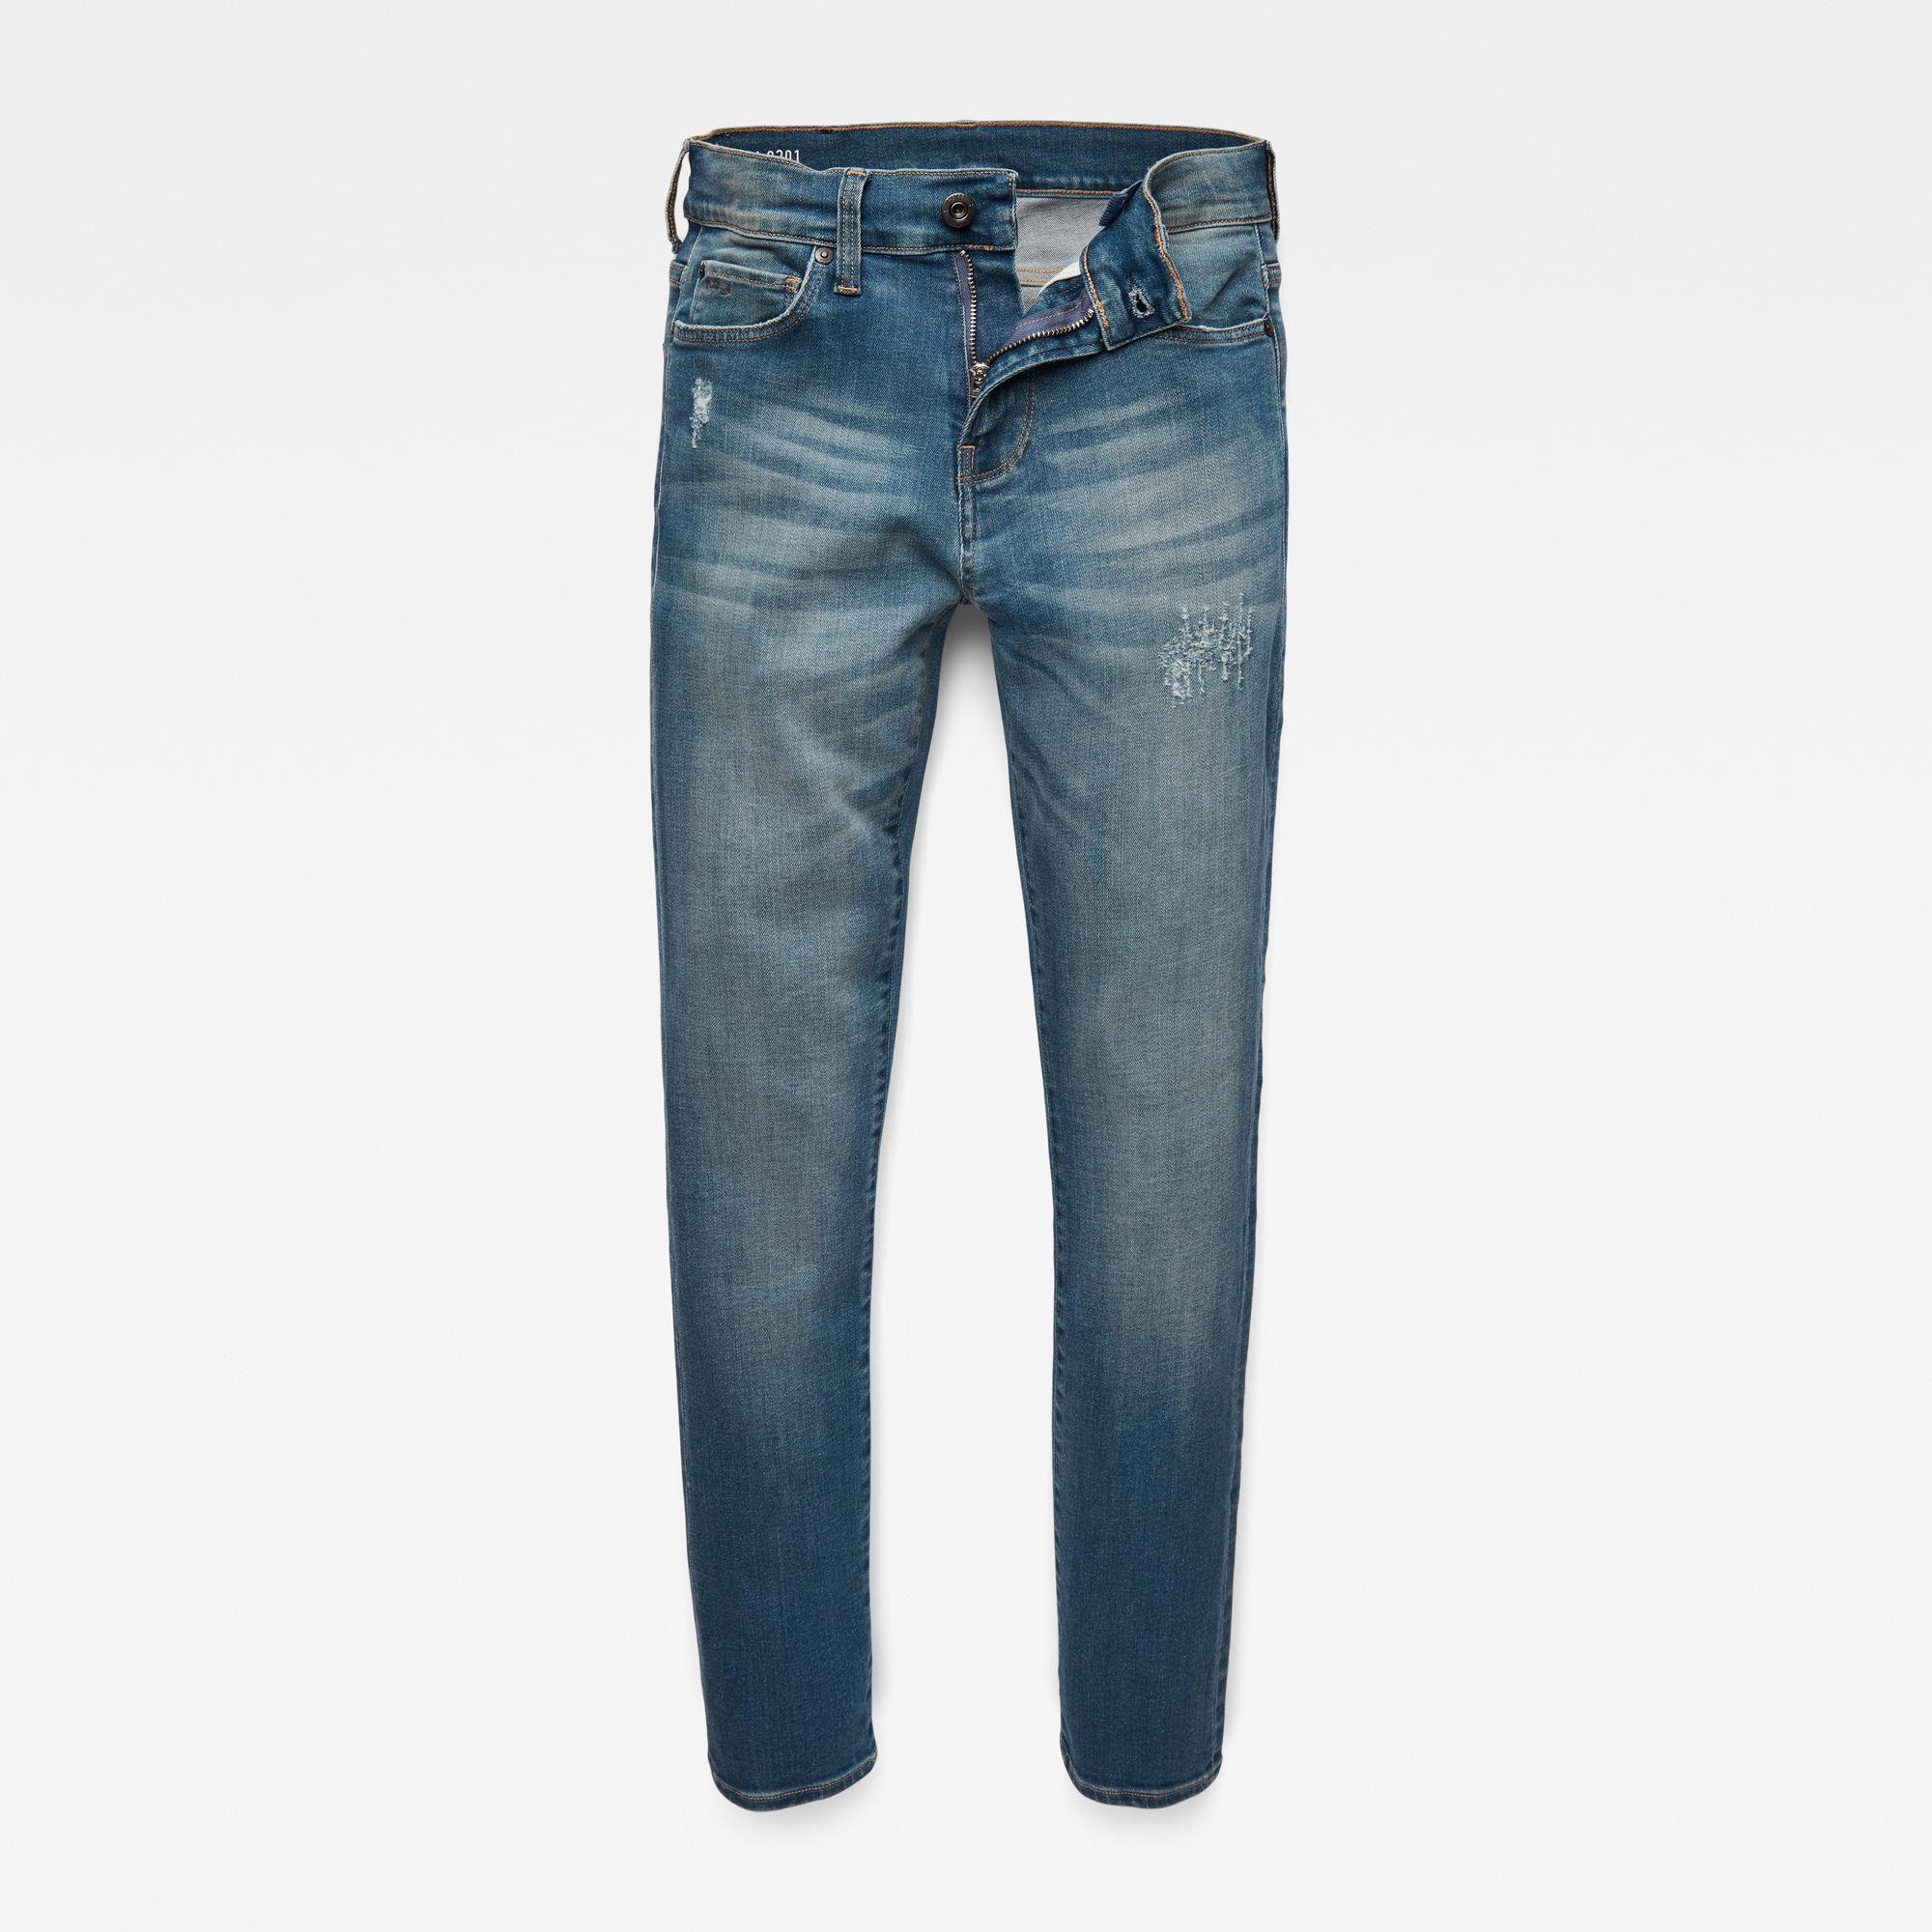 G-Star RAW Jongens 3301 Slim Jeans Blauw